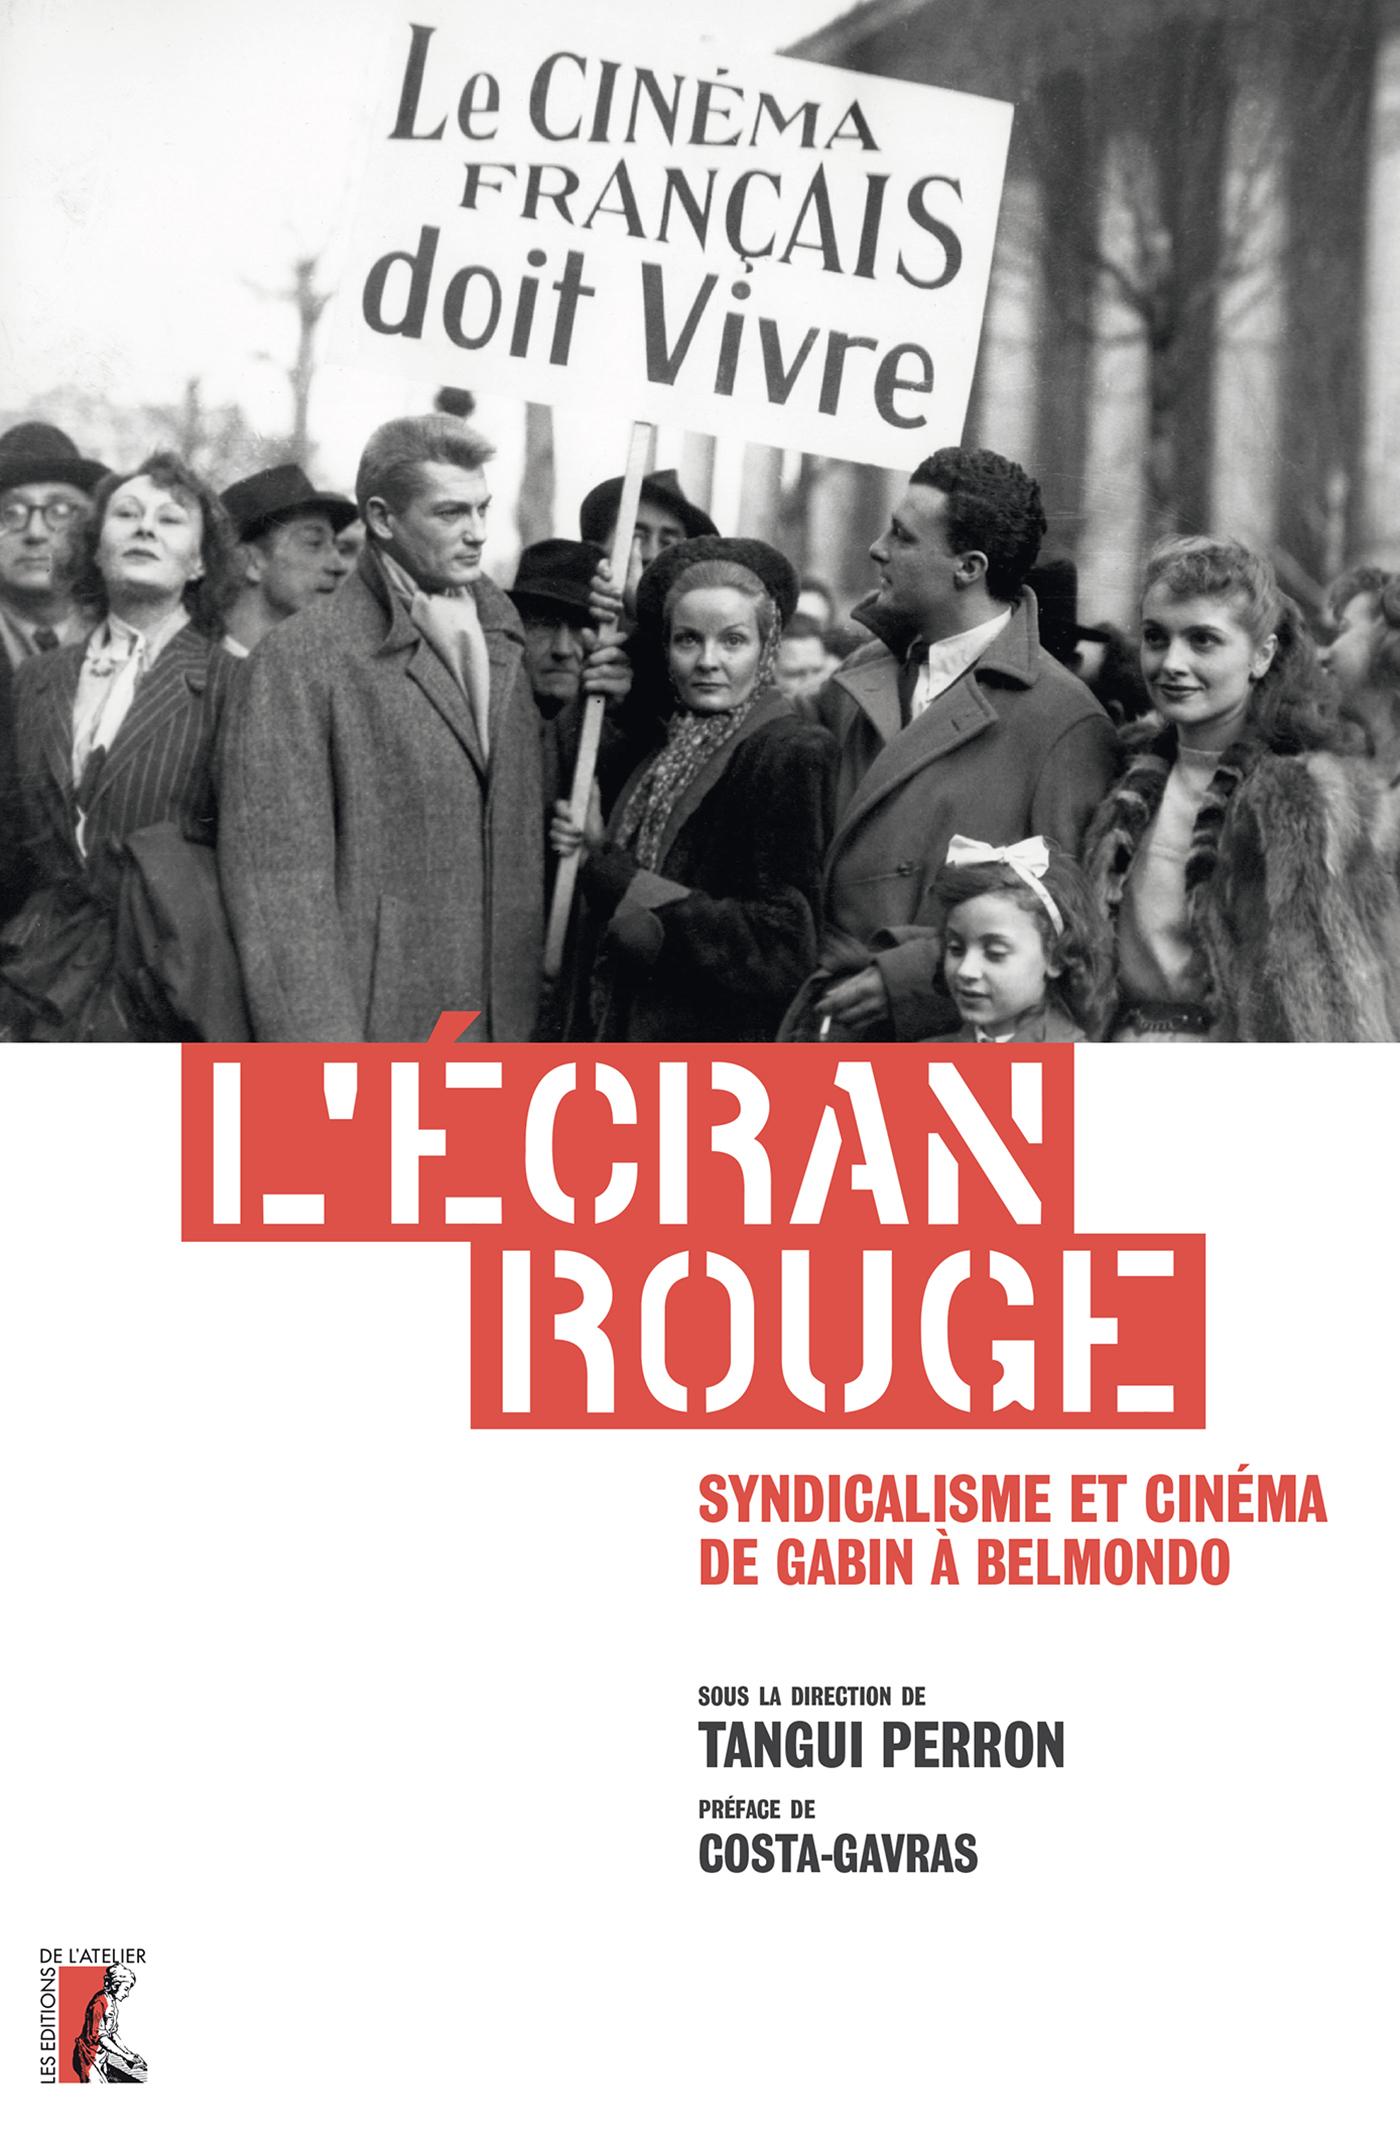 L'ECRAN ROUGE - SYNDICALISME ET CINEMA DE GABIN A BELMONDO